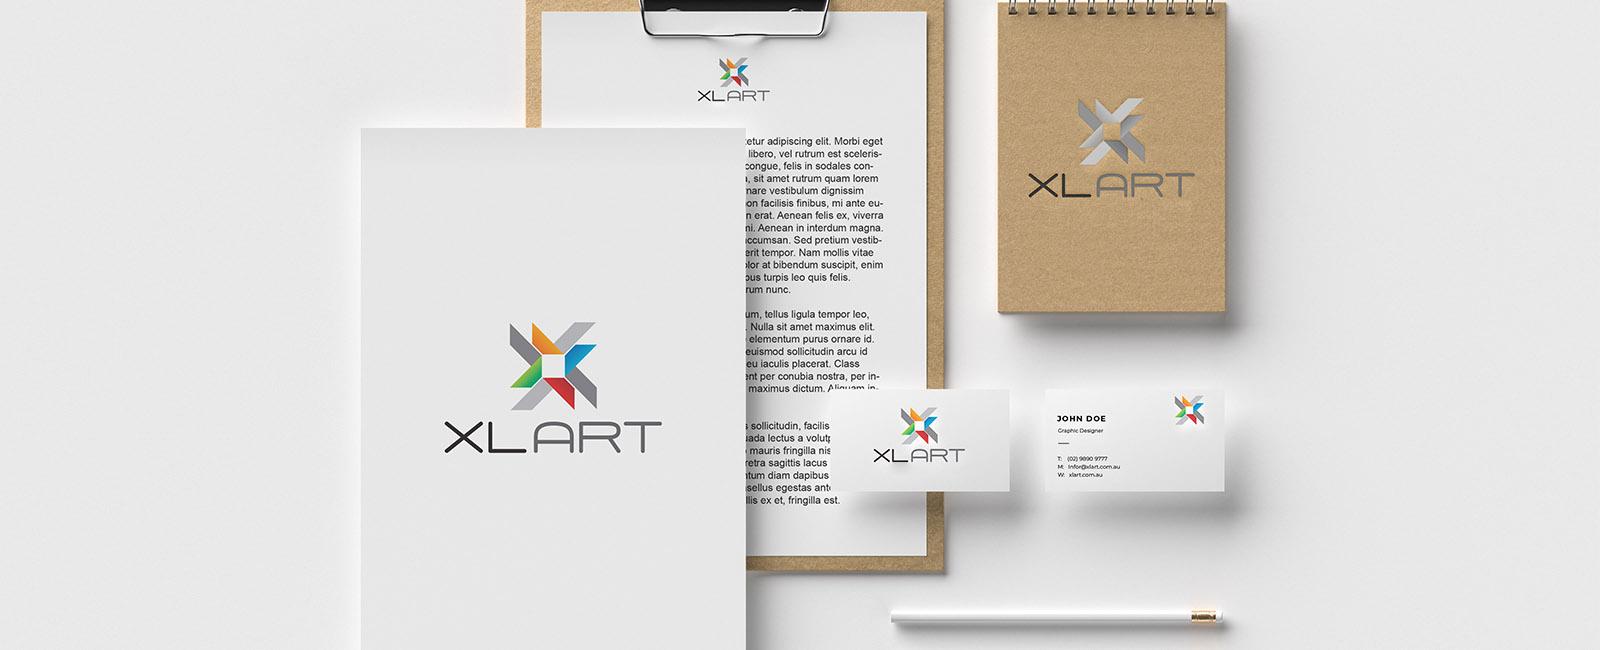 XLART document letterhead Printing Office Marketing Materials Sydney Australia Digital Print Sydney Australia DTS